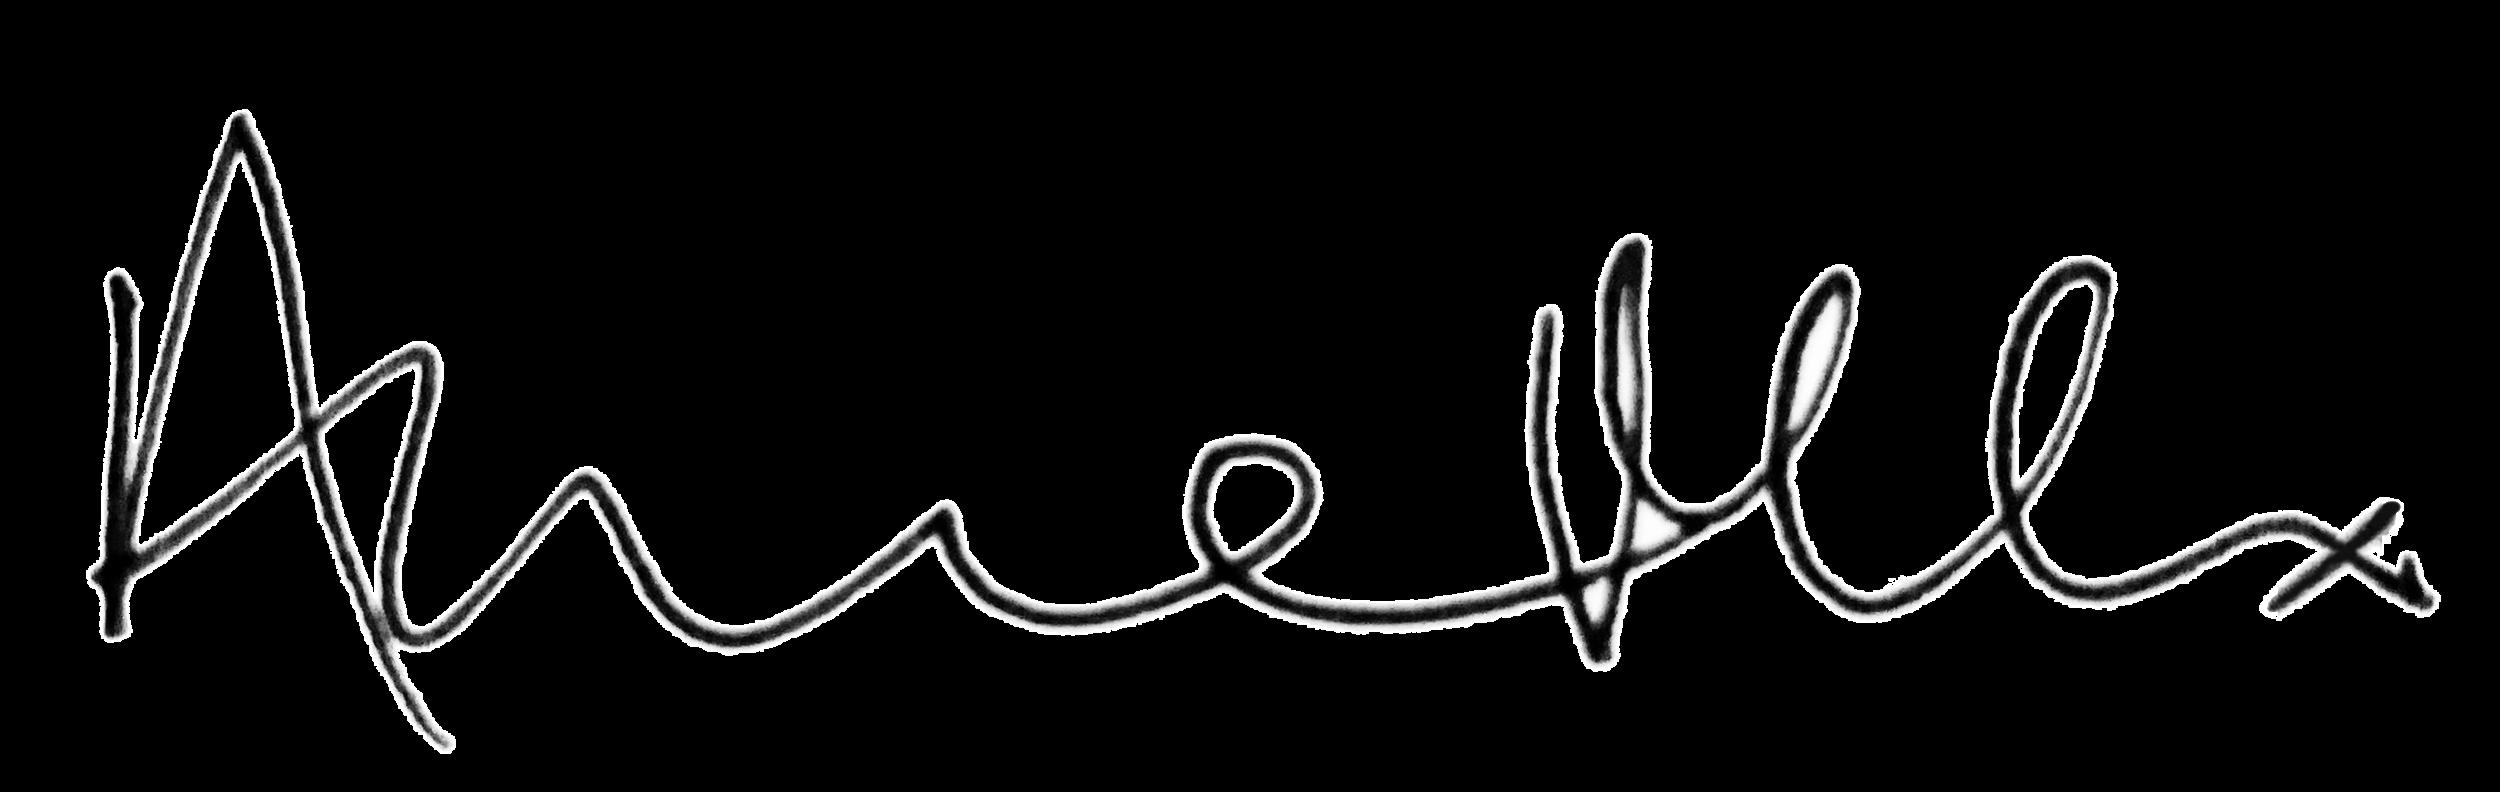 Website signature 2.png